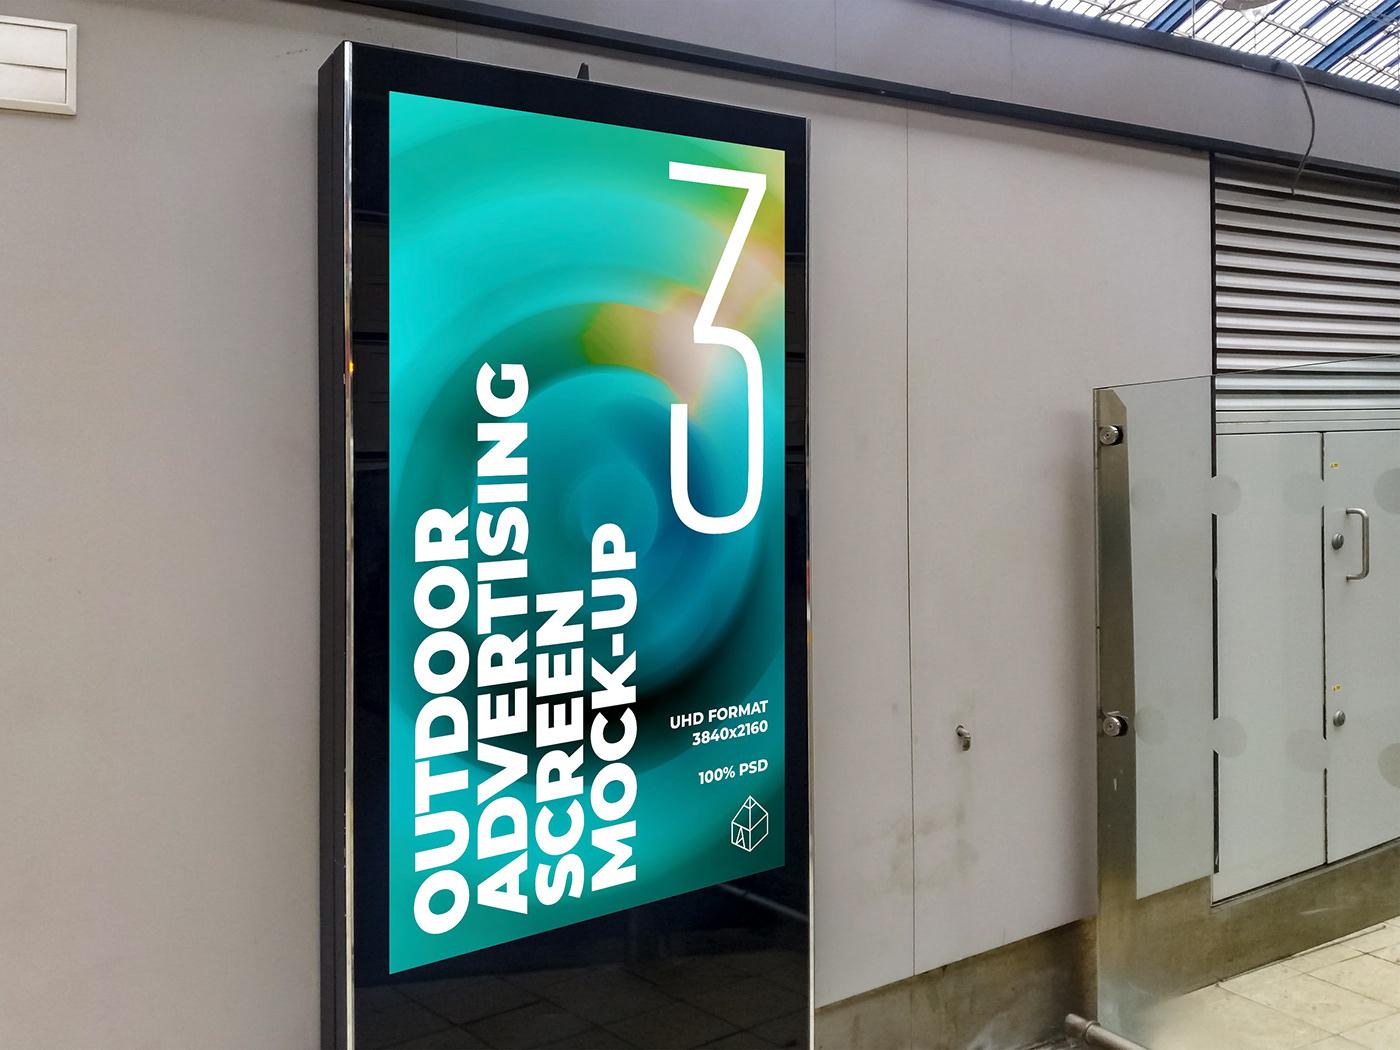 ad advertisement Advertising  design mock-up Mockup Outdoor poster screen Street